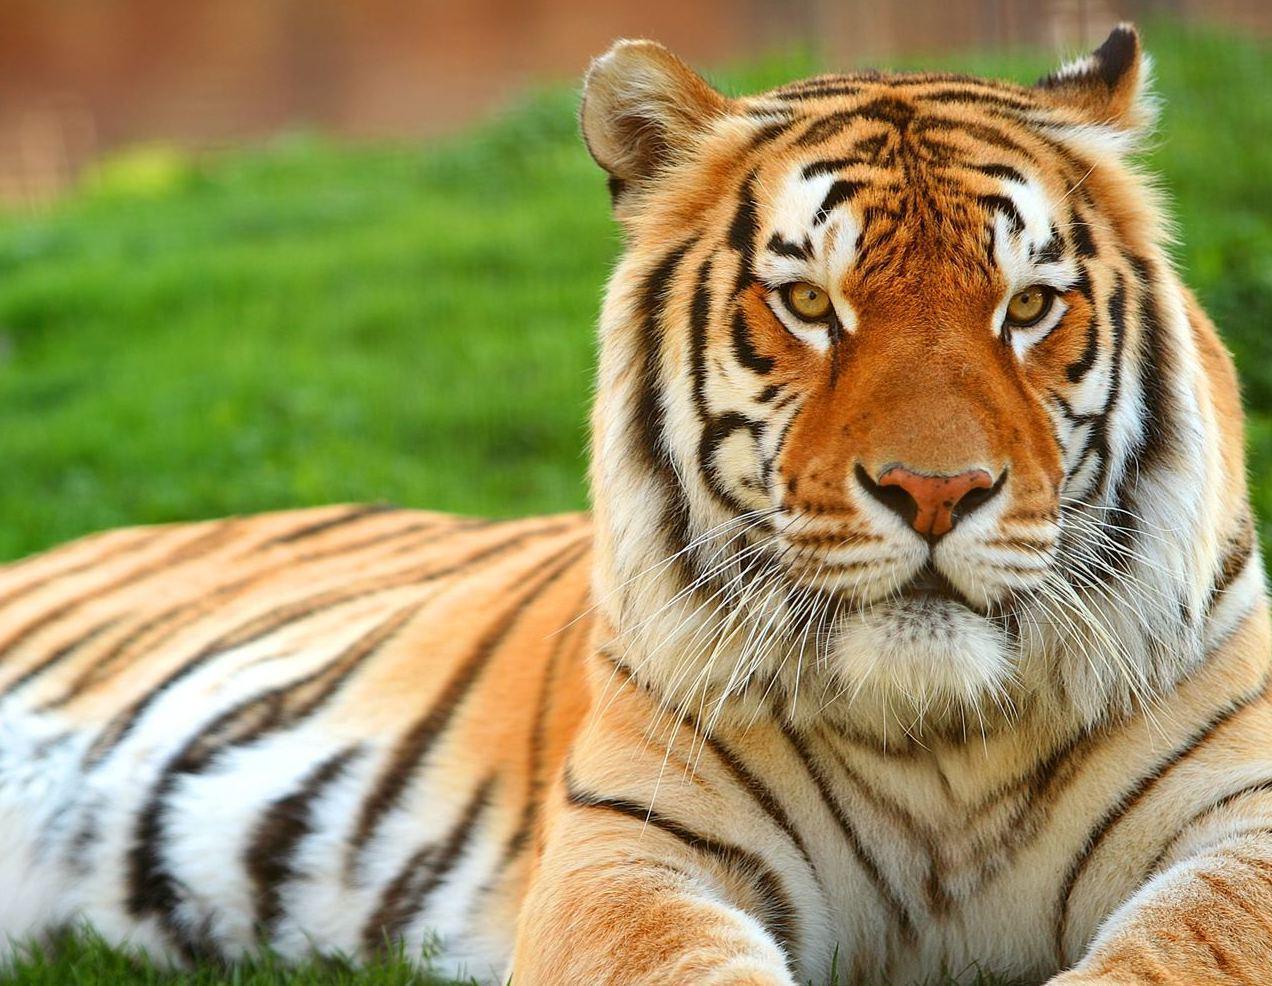 Tiger Wallpaper Desktop Background Animals Wallpapers